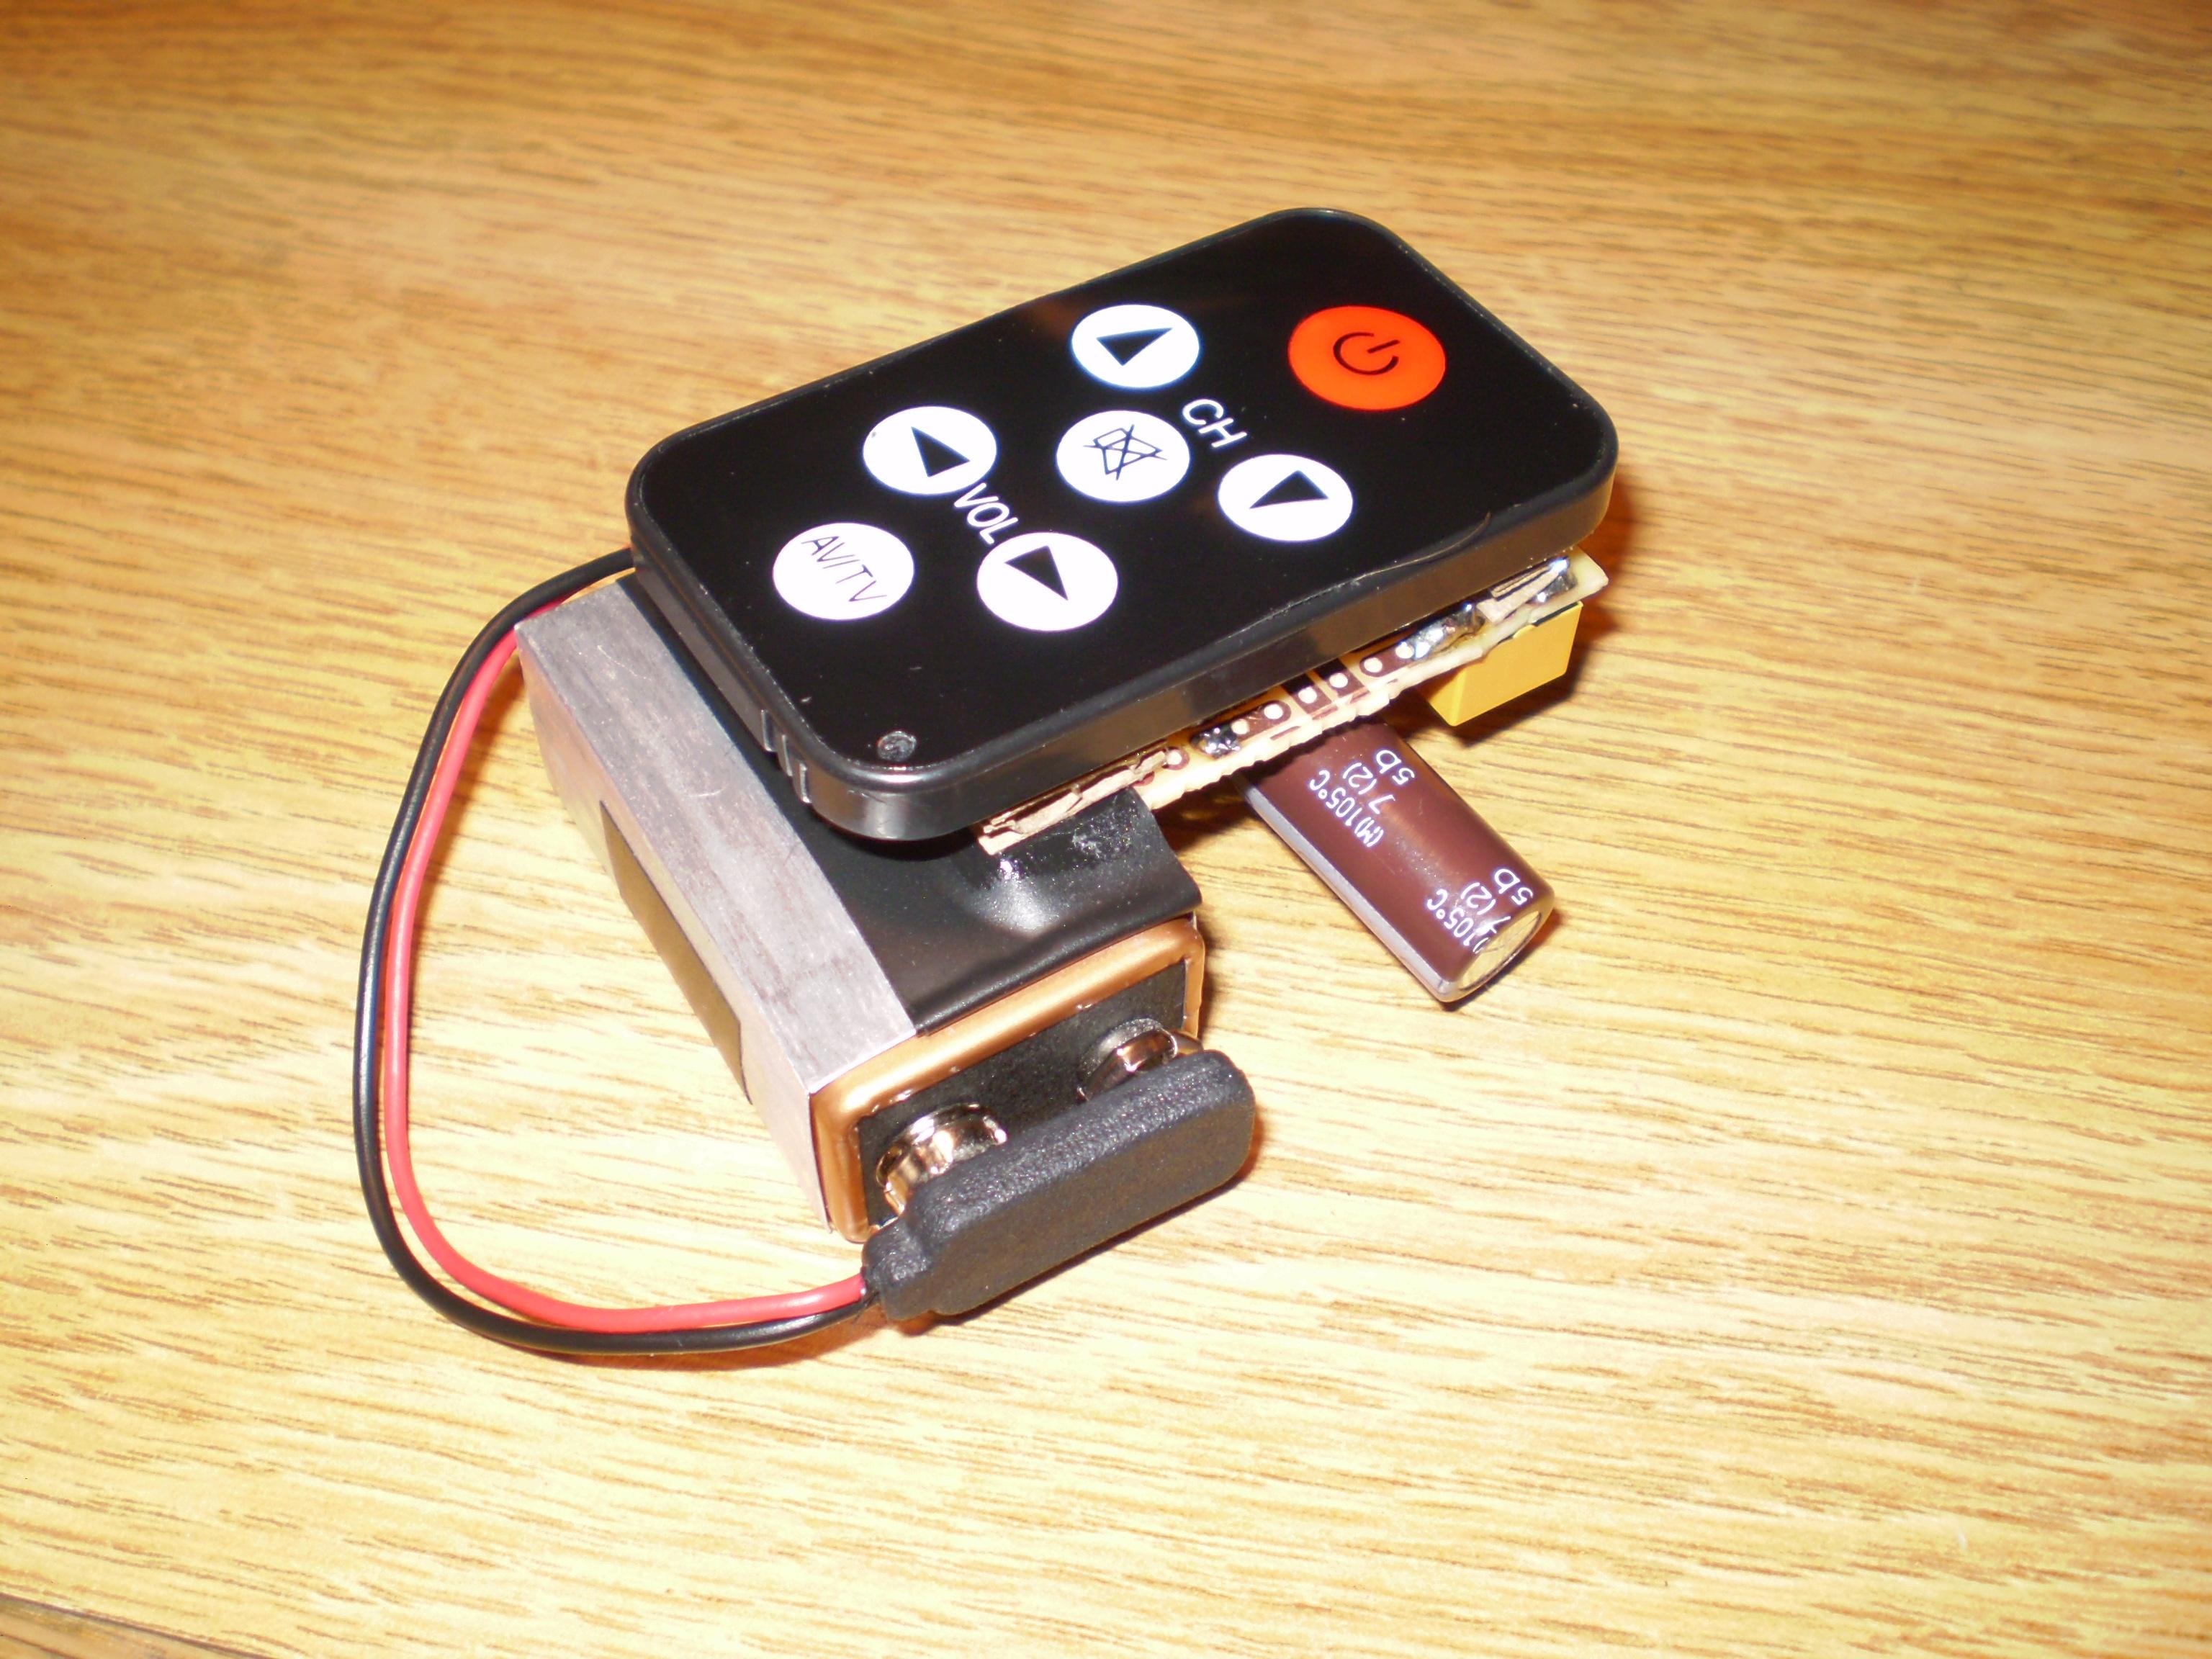 Auto Spy Remote